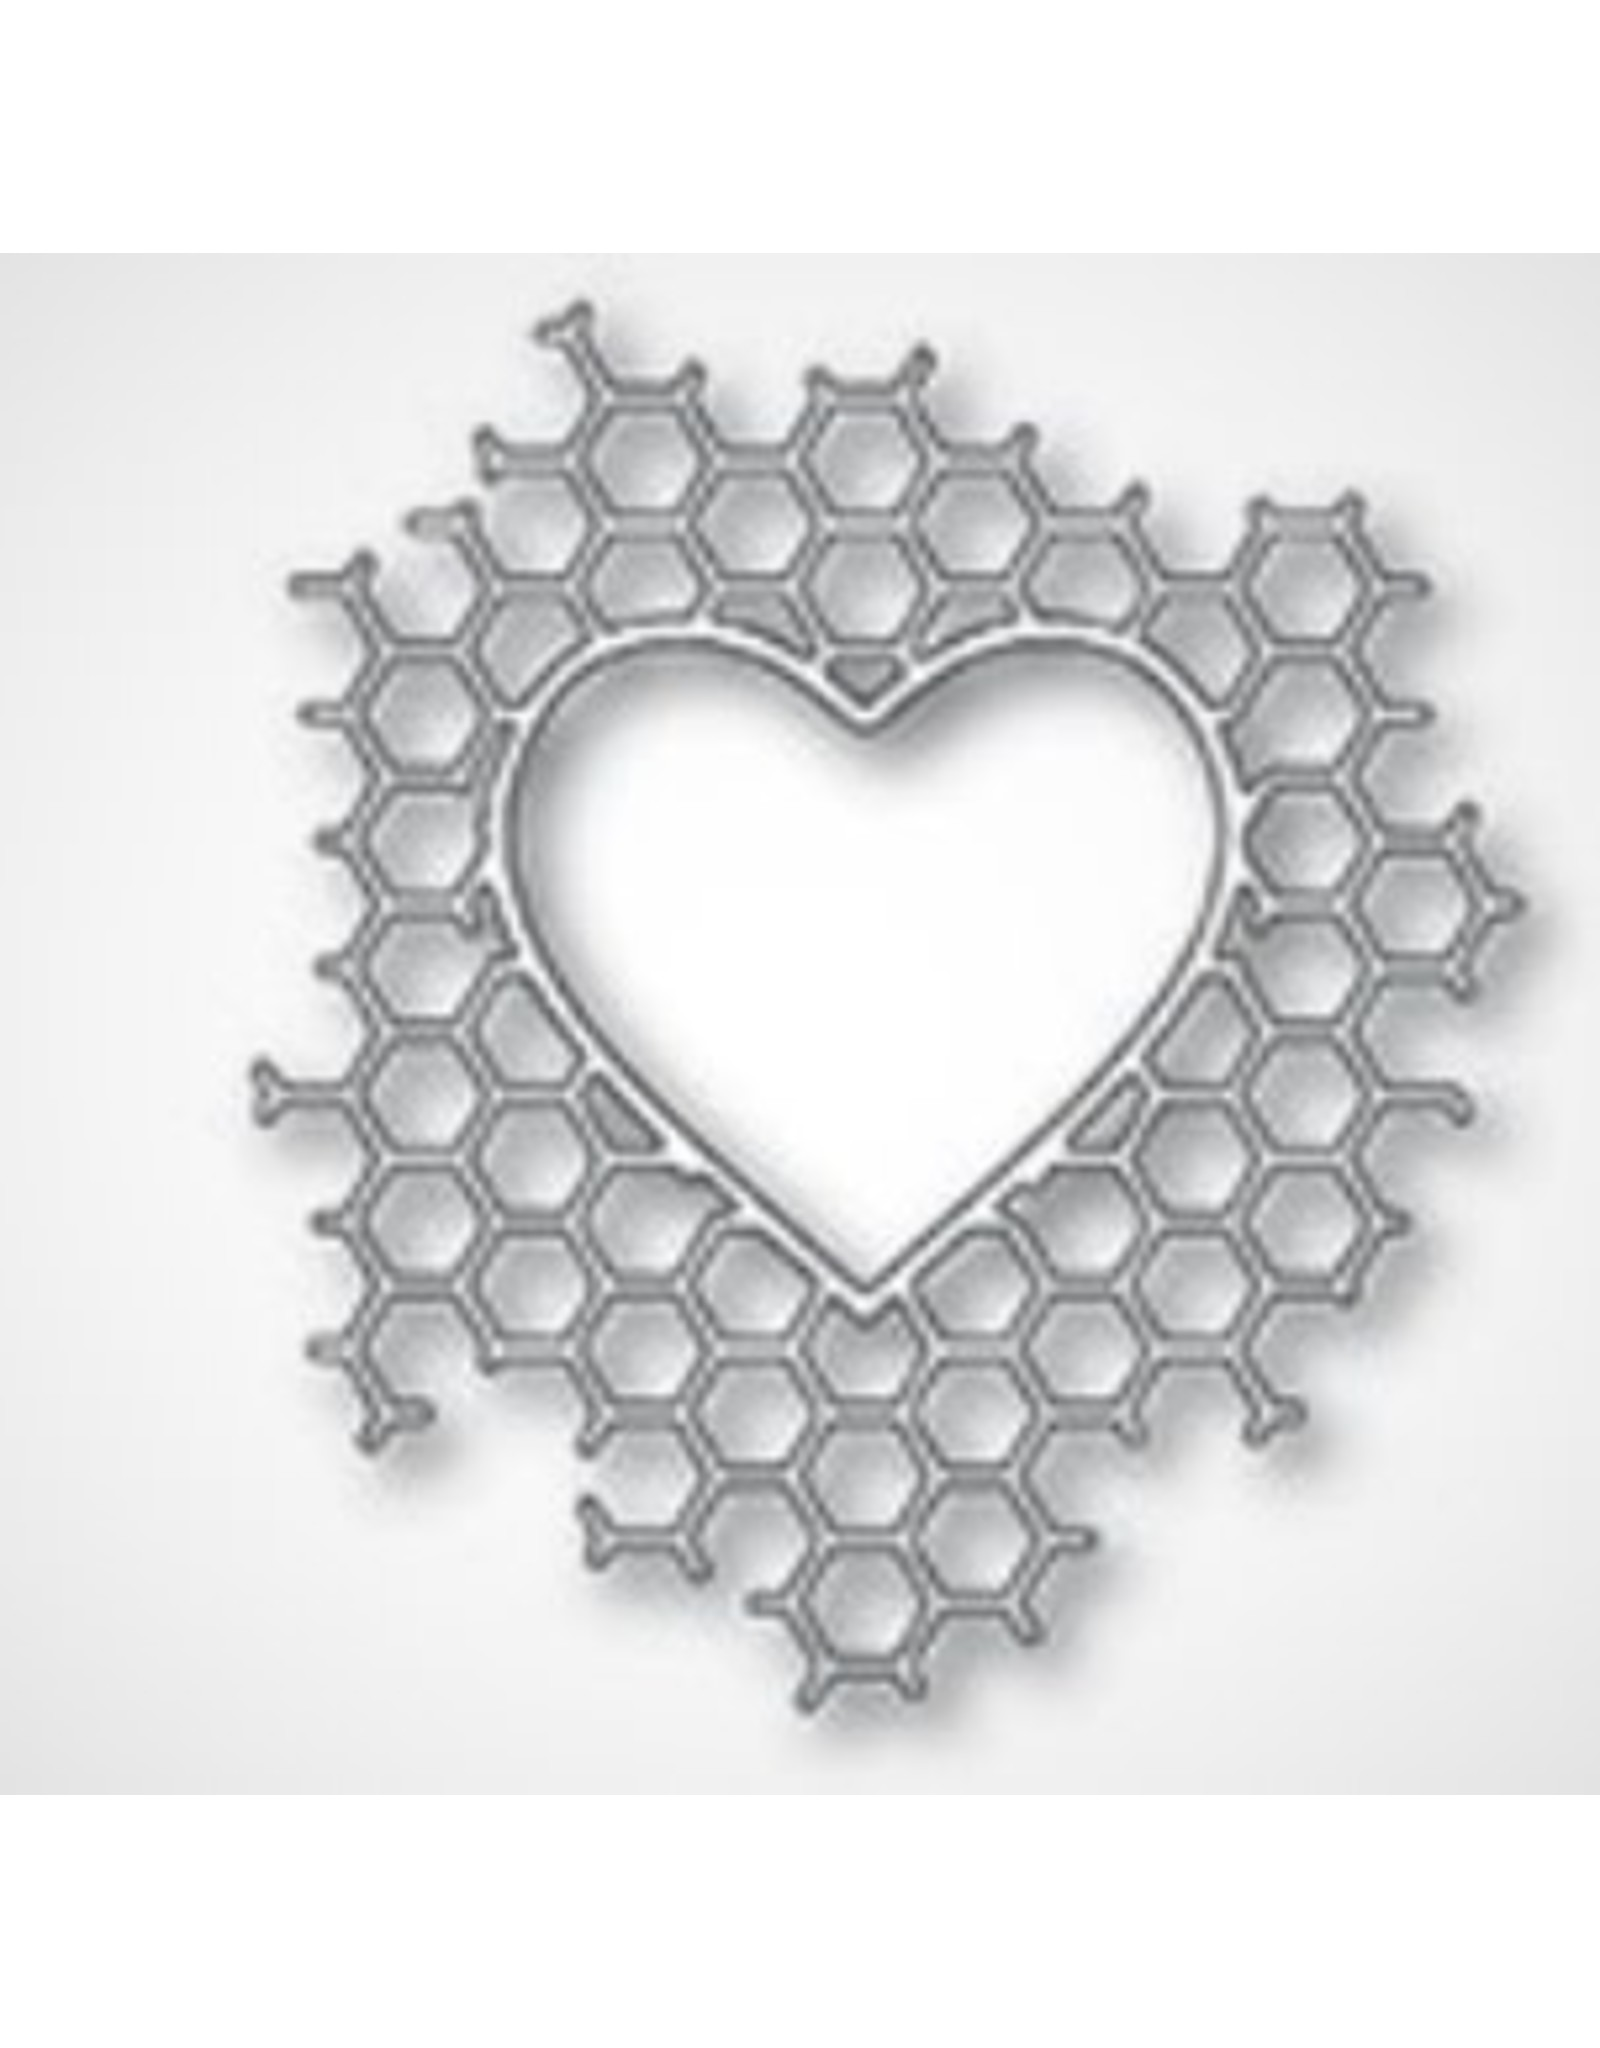 Memory Box Honeycomb Heart - Die